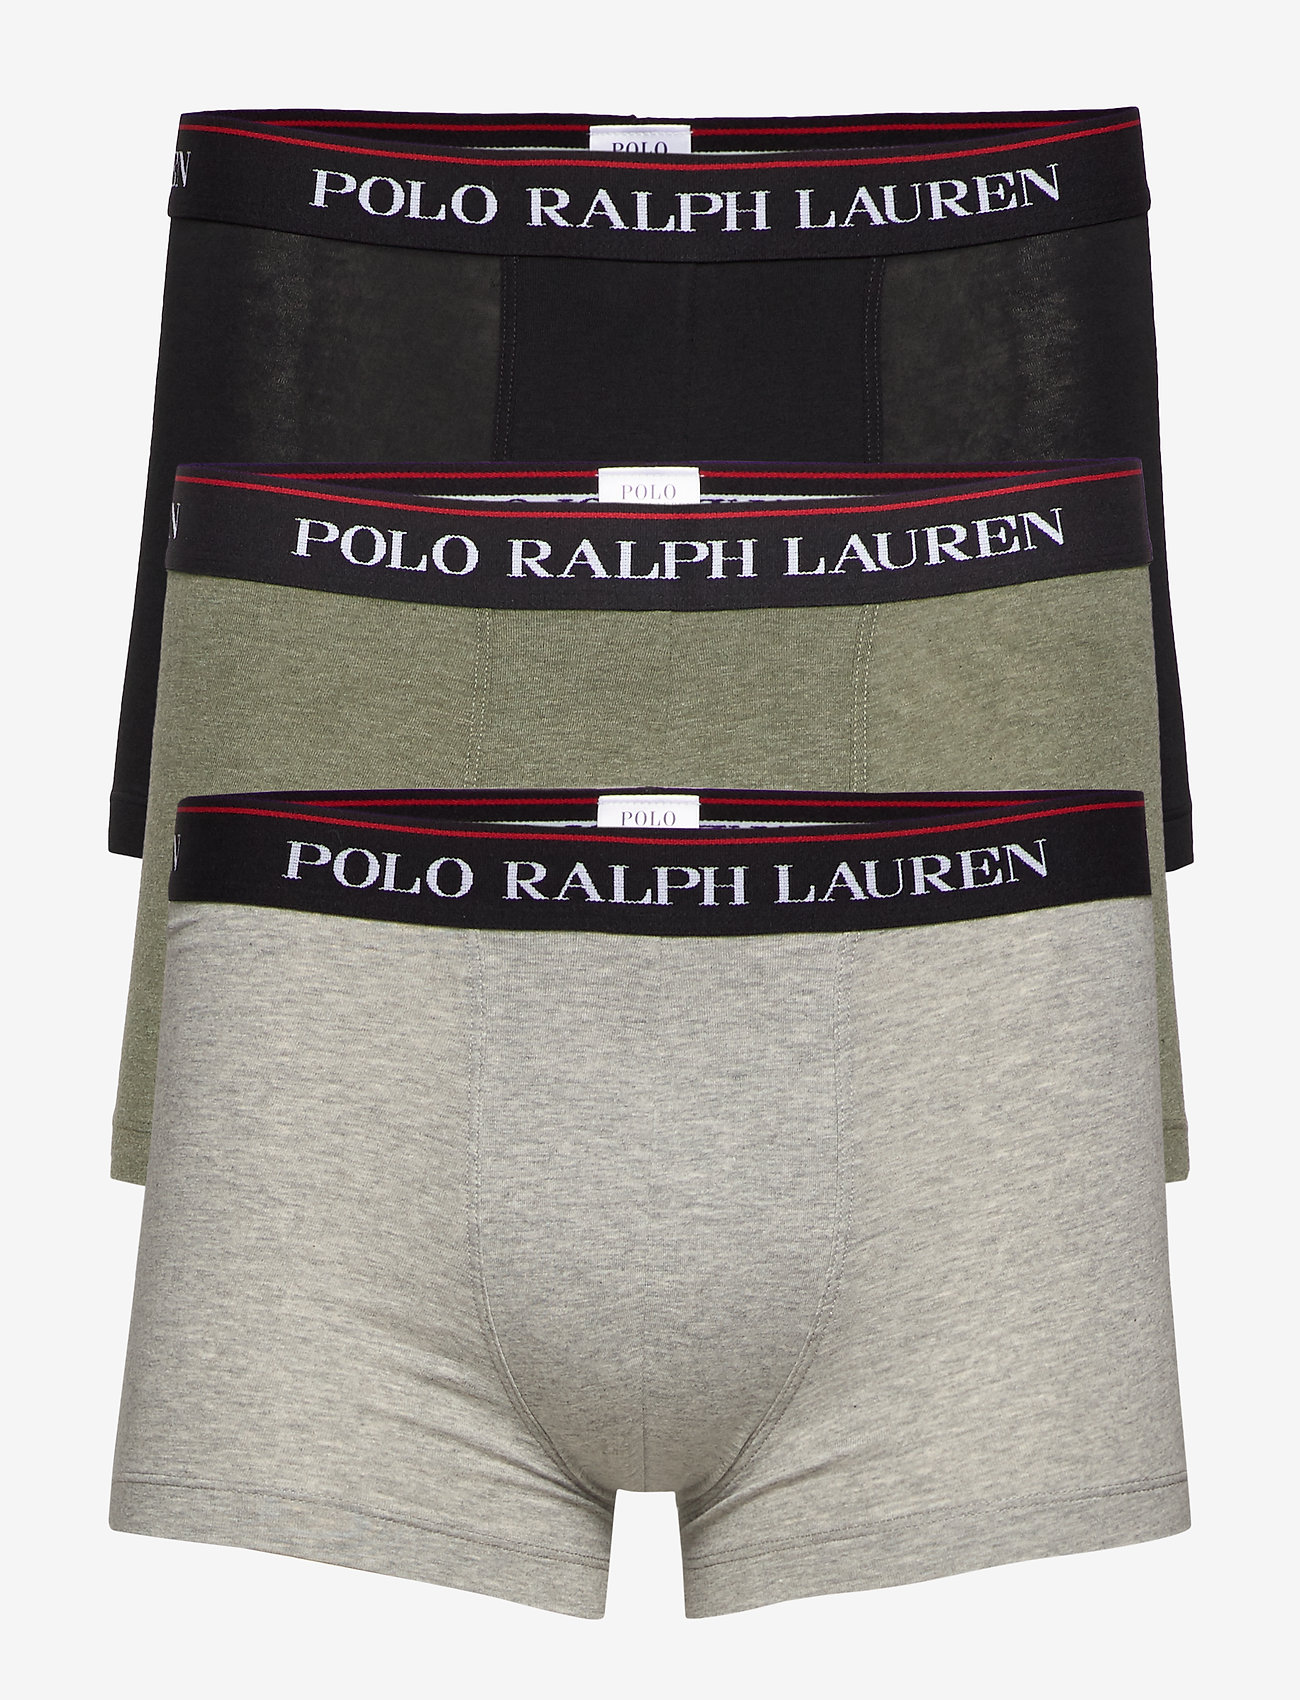 Polo Ralph Lauren Underwear - Stretch-Cotton Trunk 3-Pack - boxers - 3pk blk/and hthr/ - 0